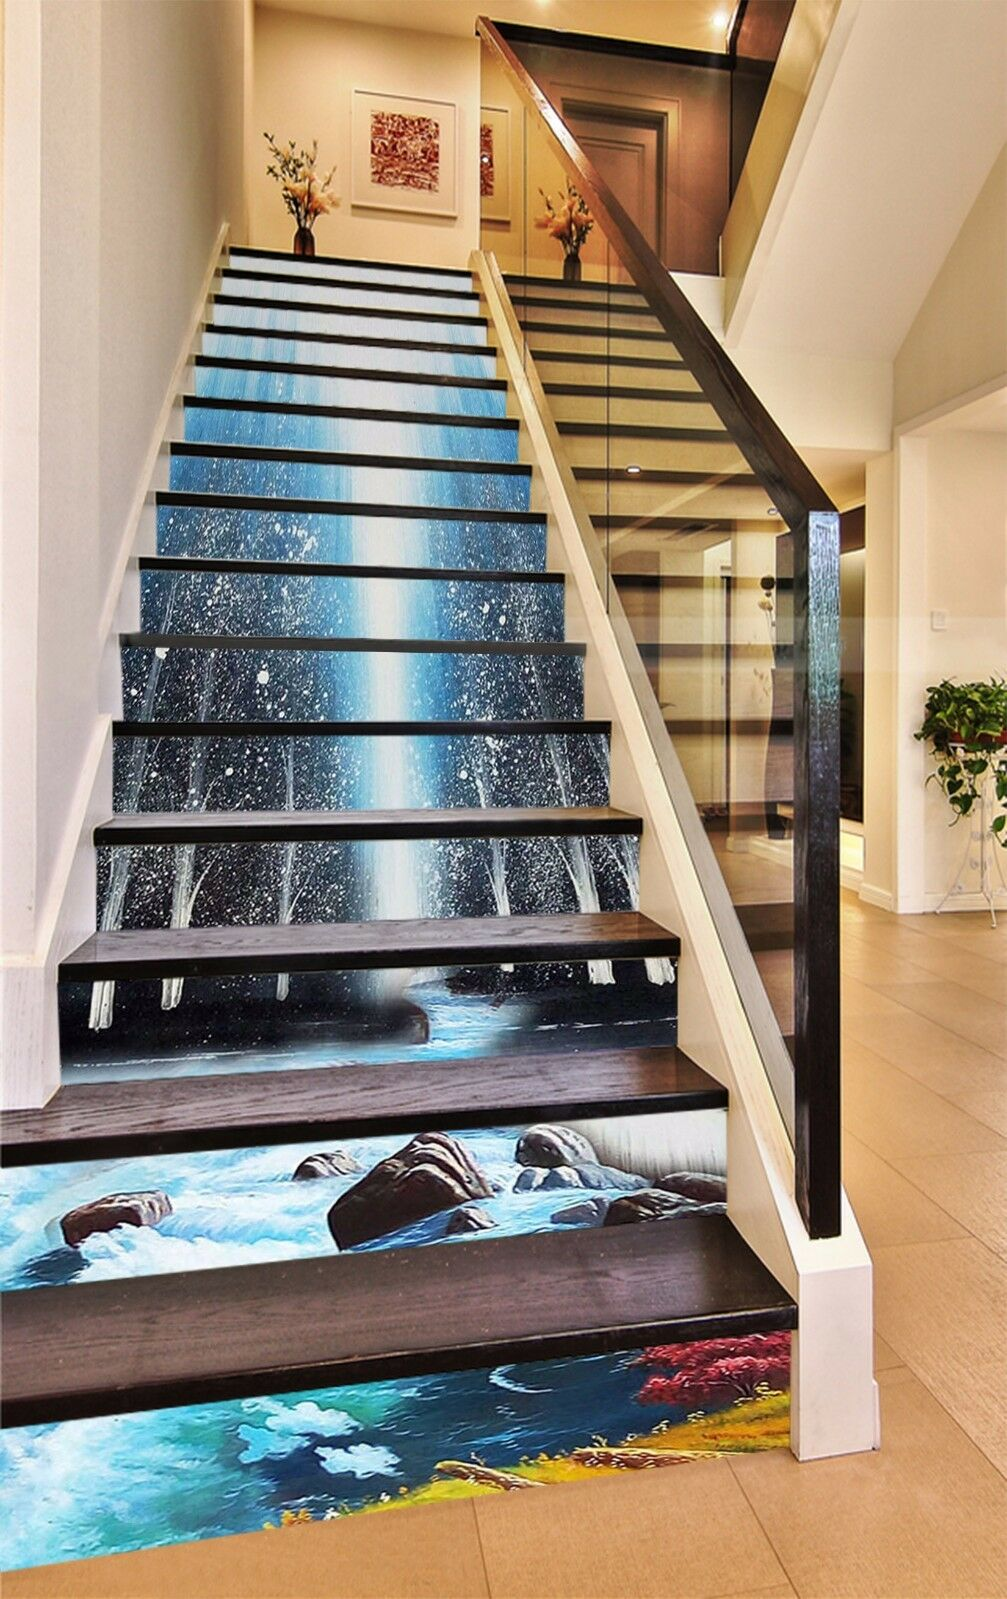 3D brillante River 133 escaleras decoración mural De vinilo Calcomanía elevadores nos Papel Tapiz De mural Foto 9cc32d